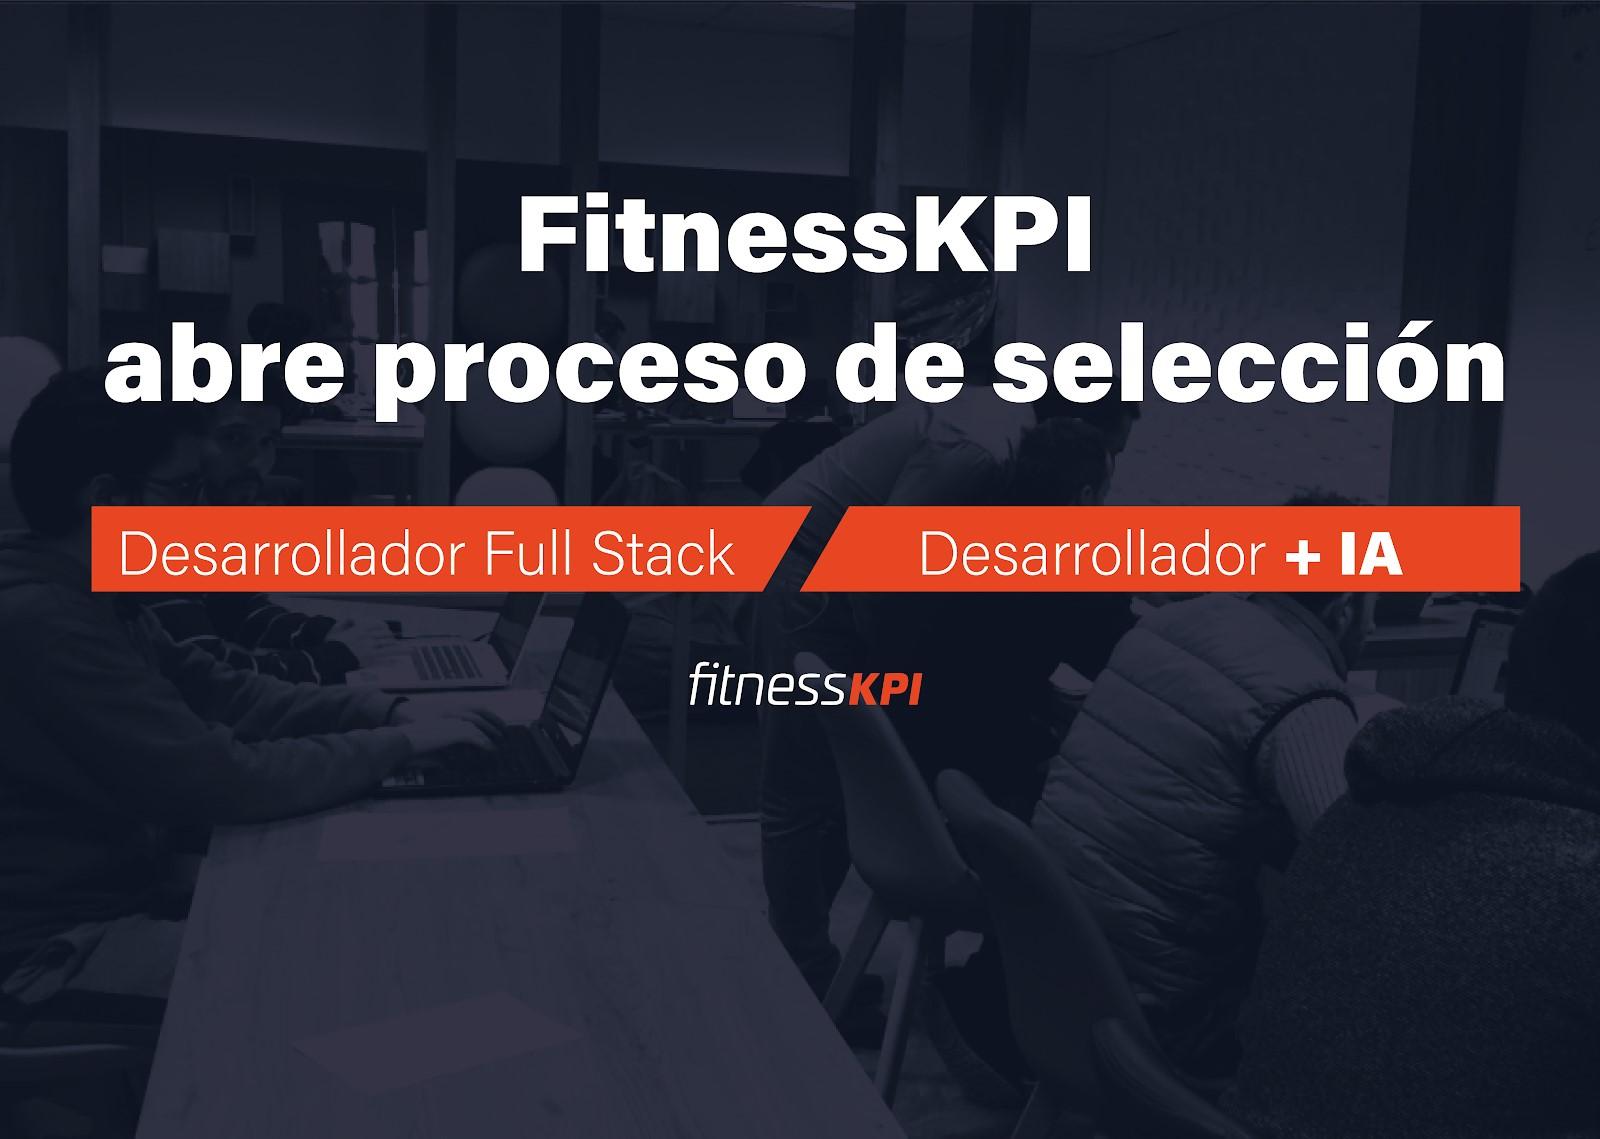 FitnessKPI busca perfiles de base tecnológica para ampliar su equipo